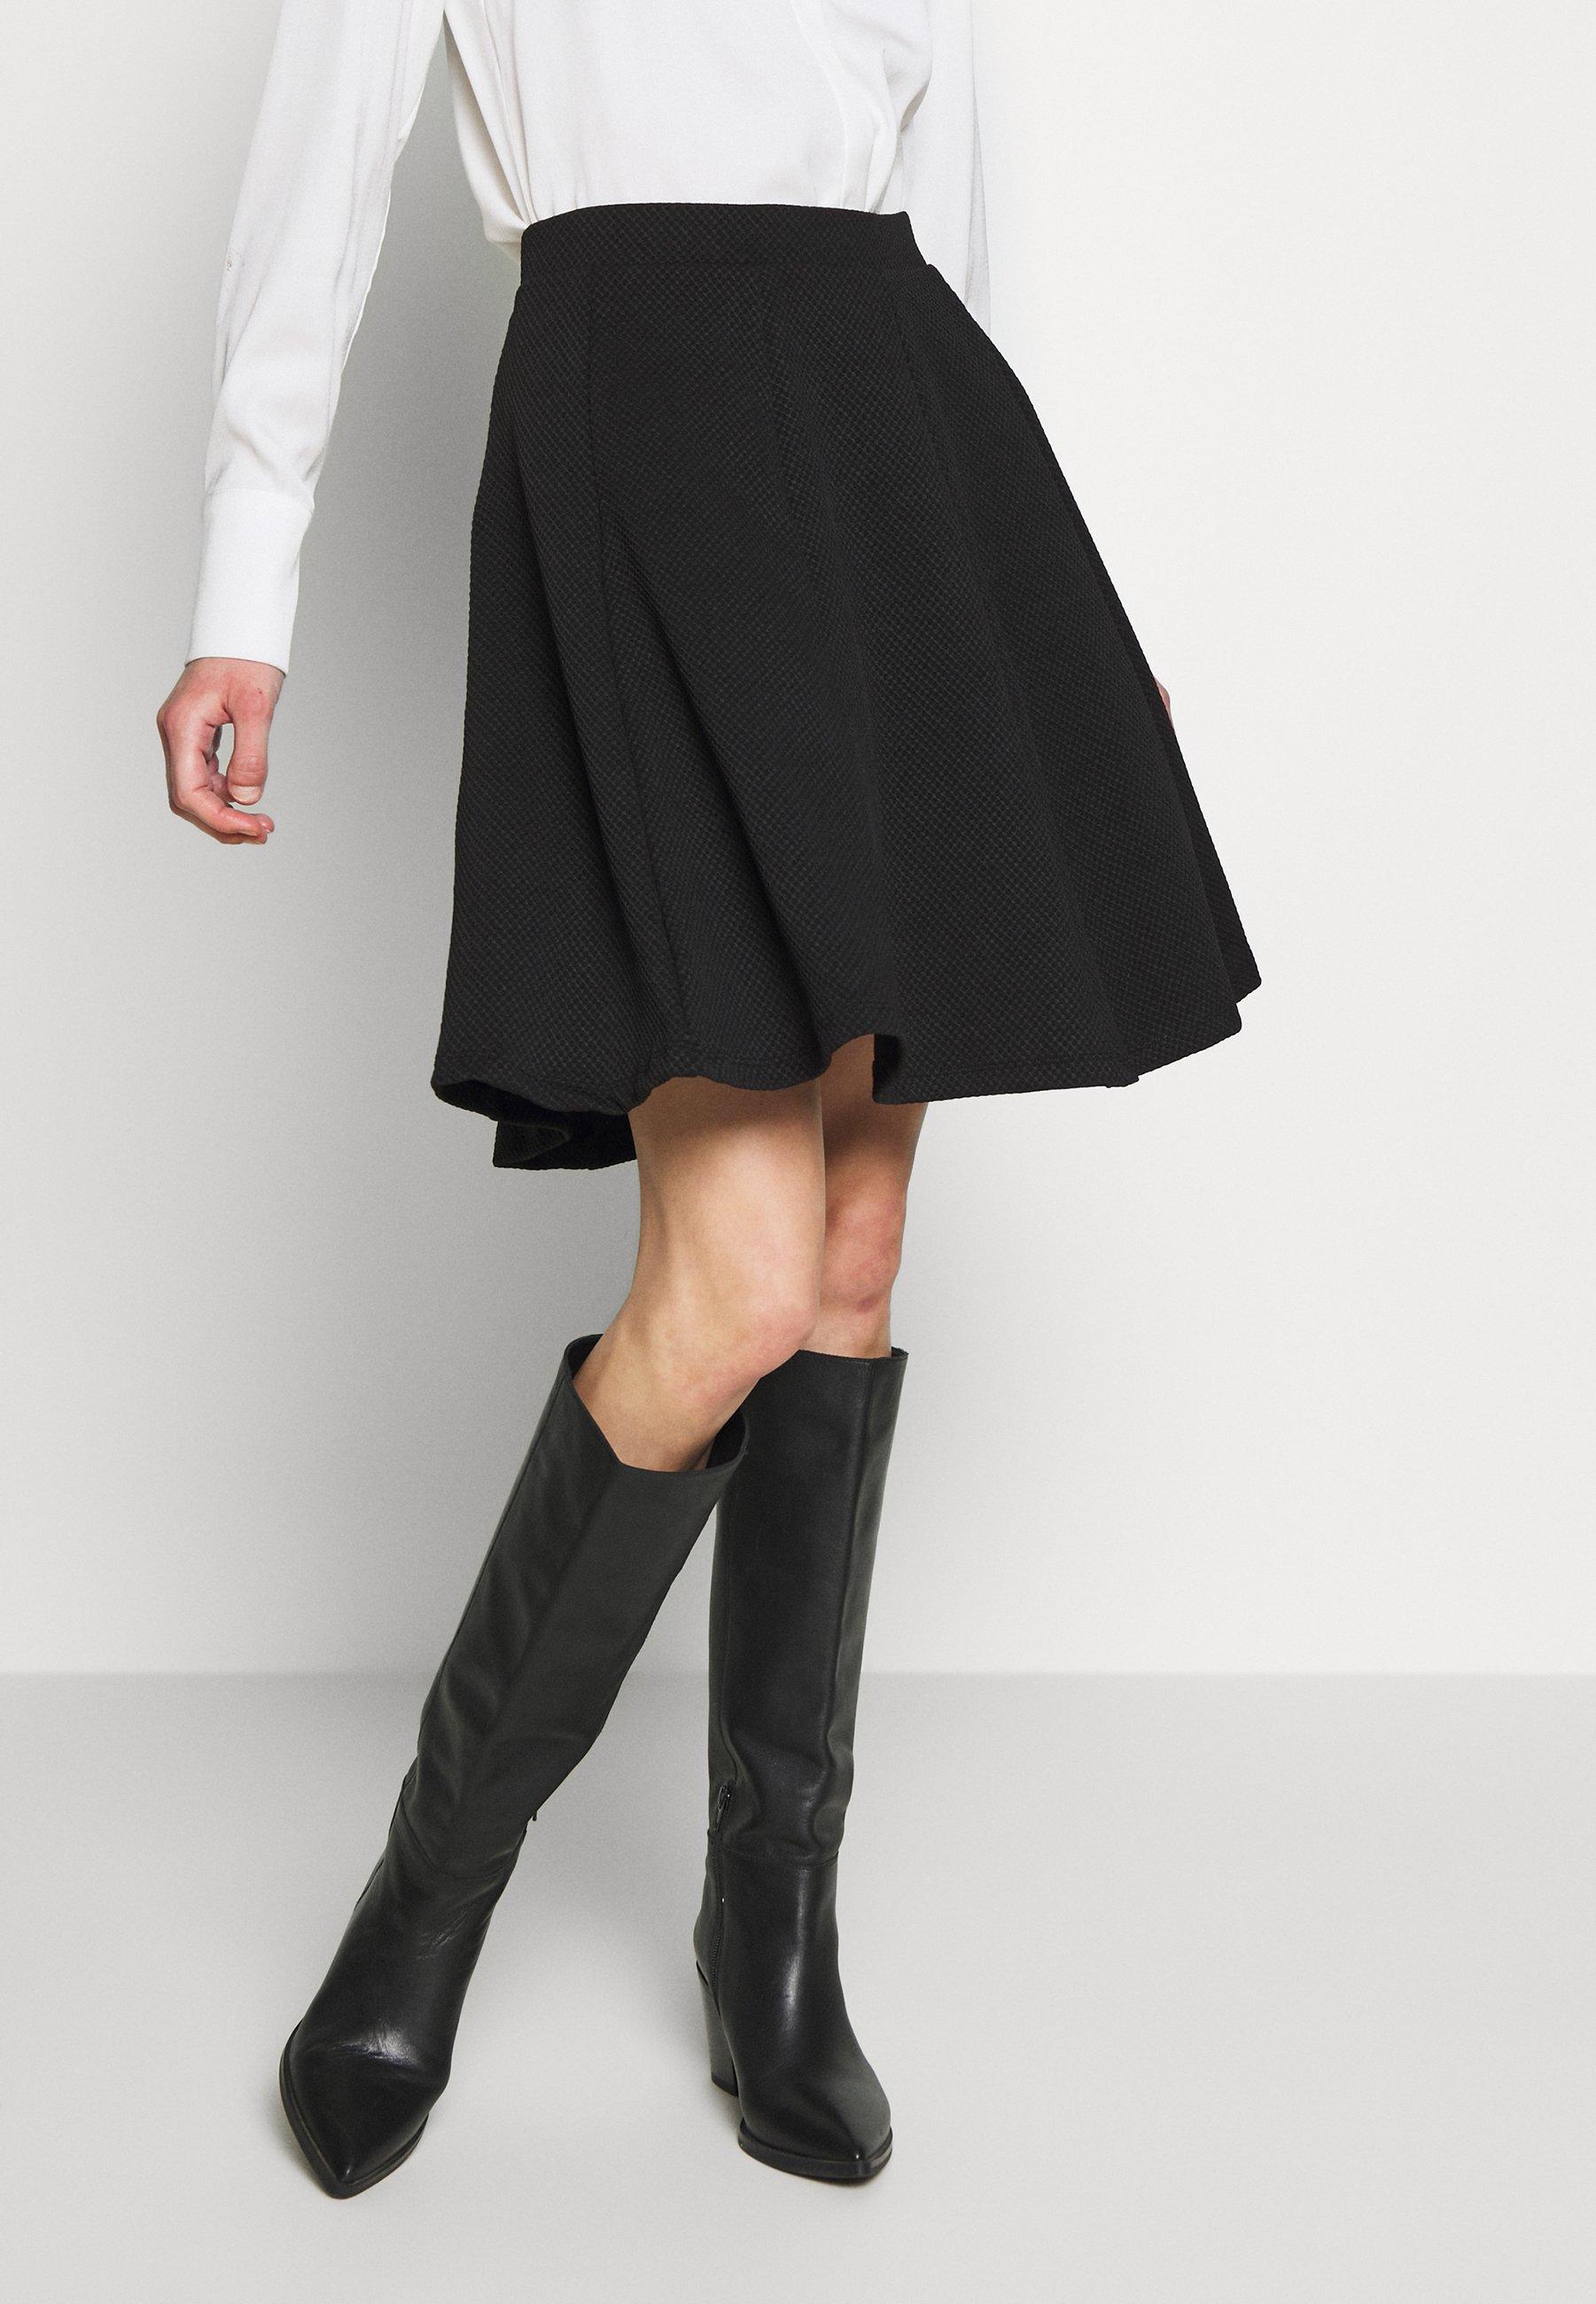 Femme BASIC MINI A-LINE SKIRT - Minijupe